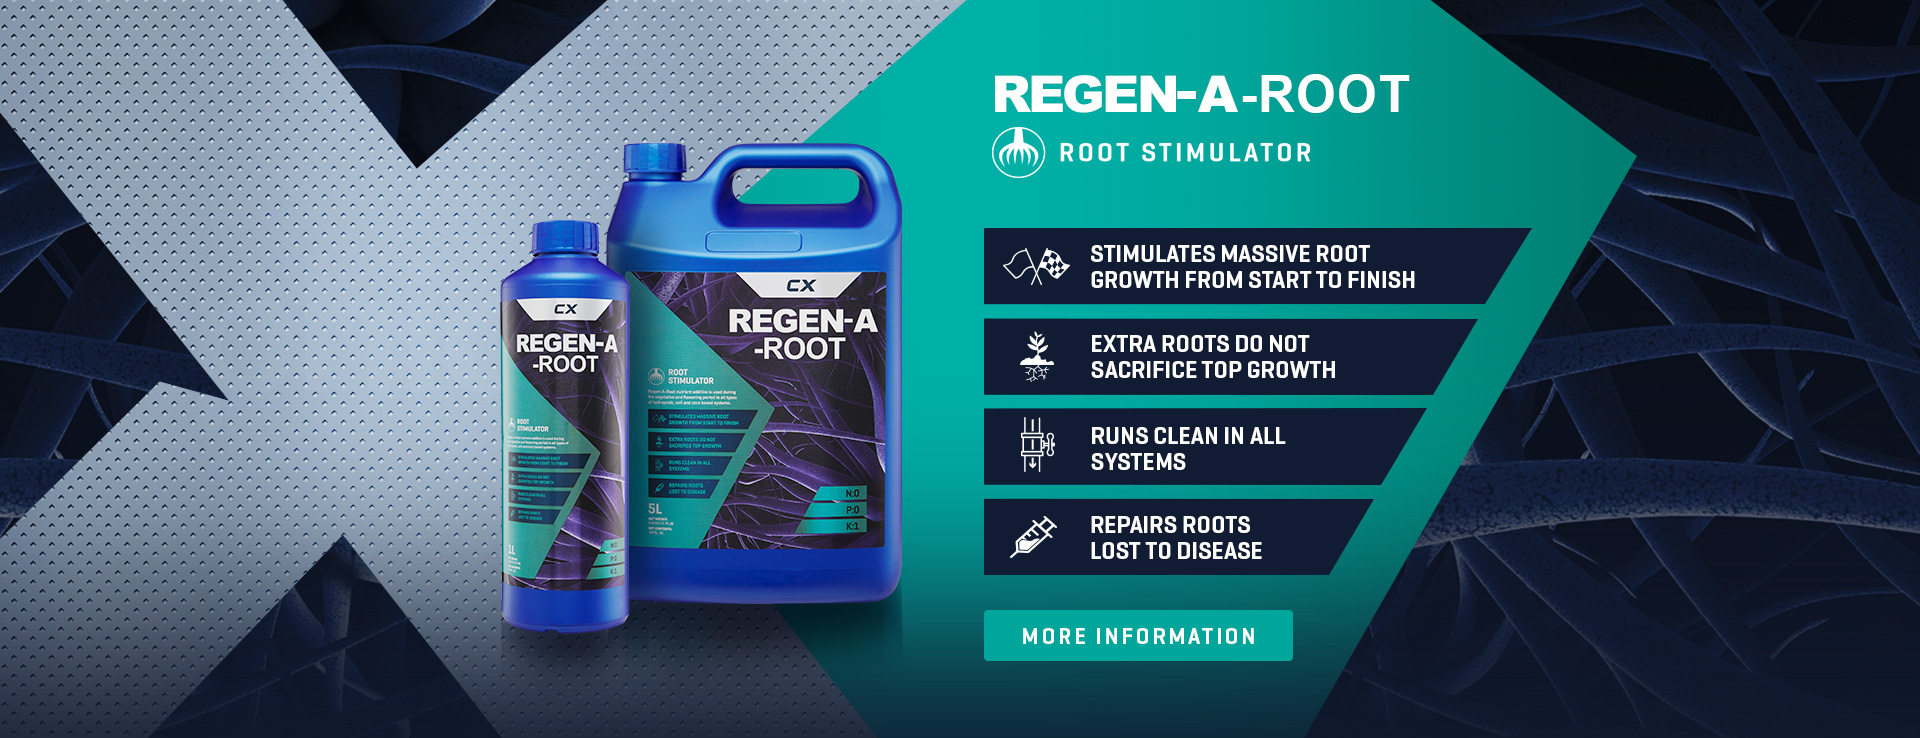 Rege-A-Root